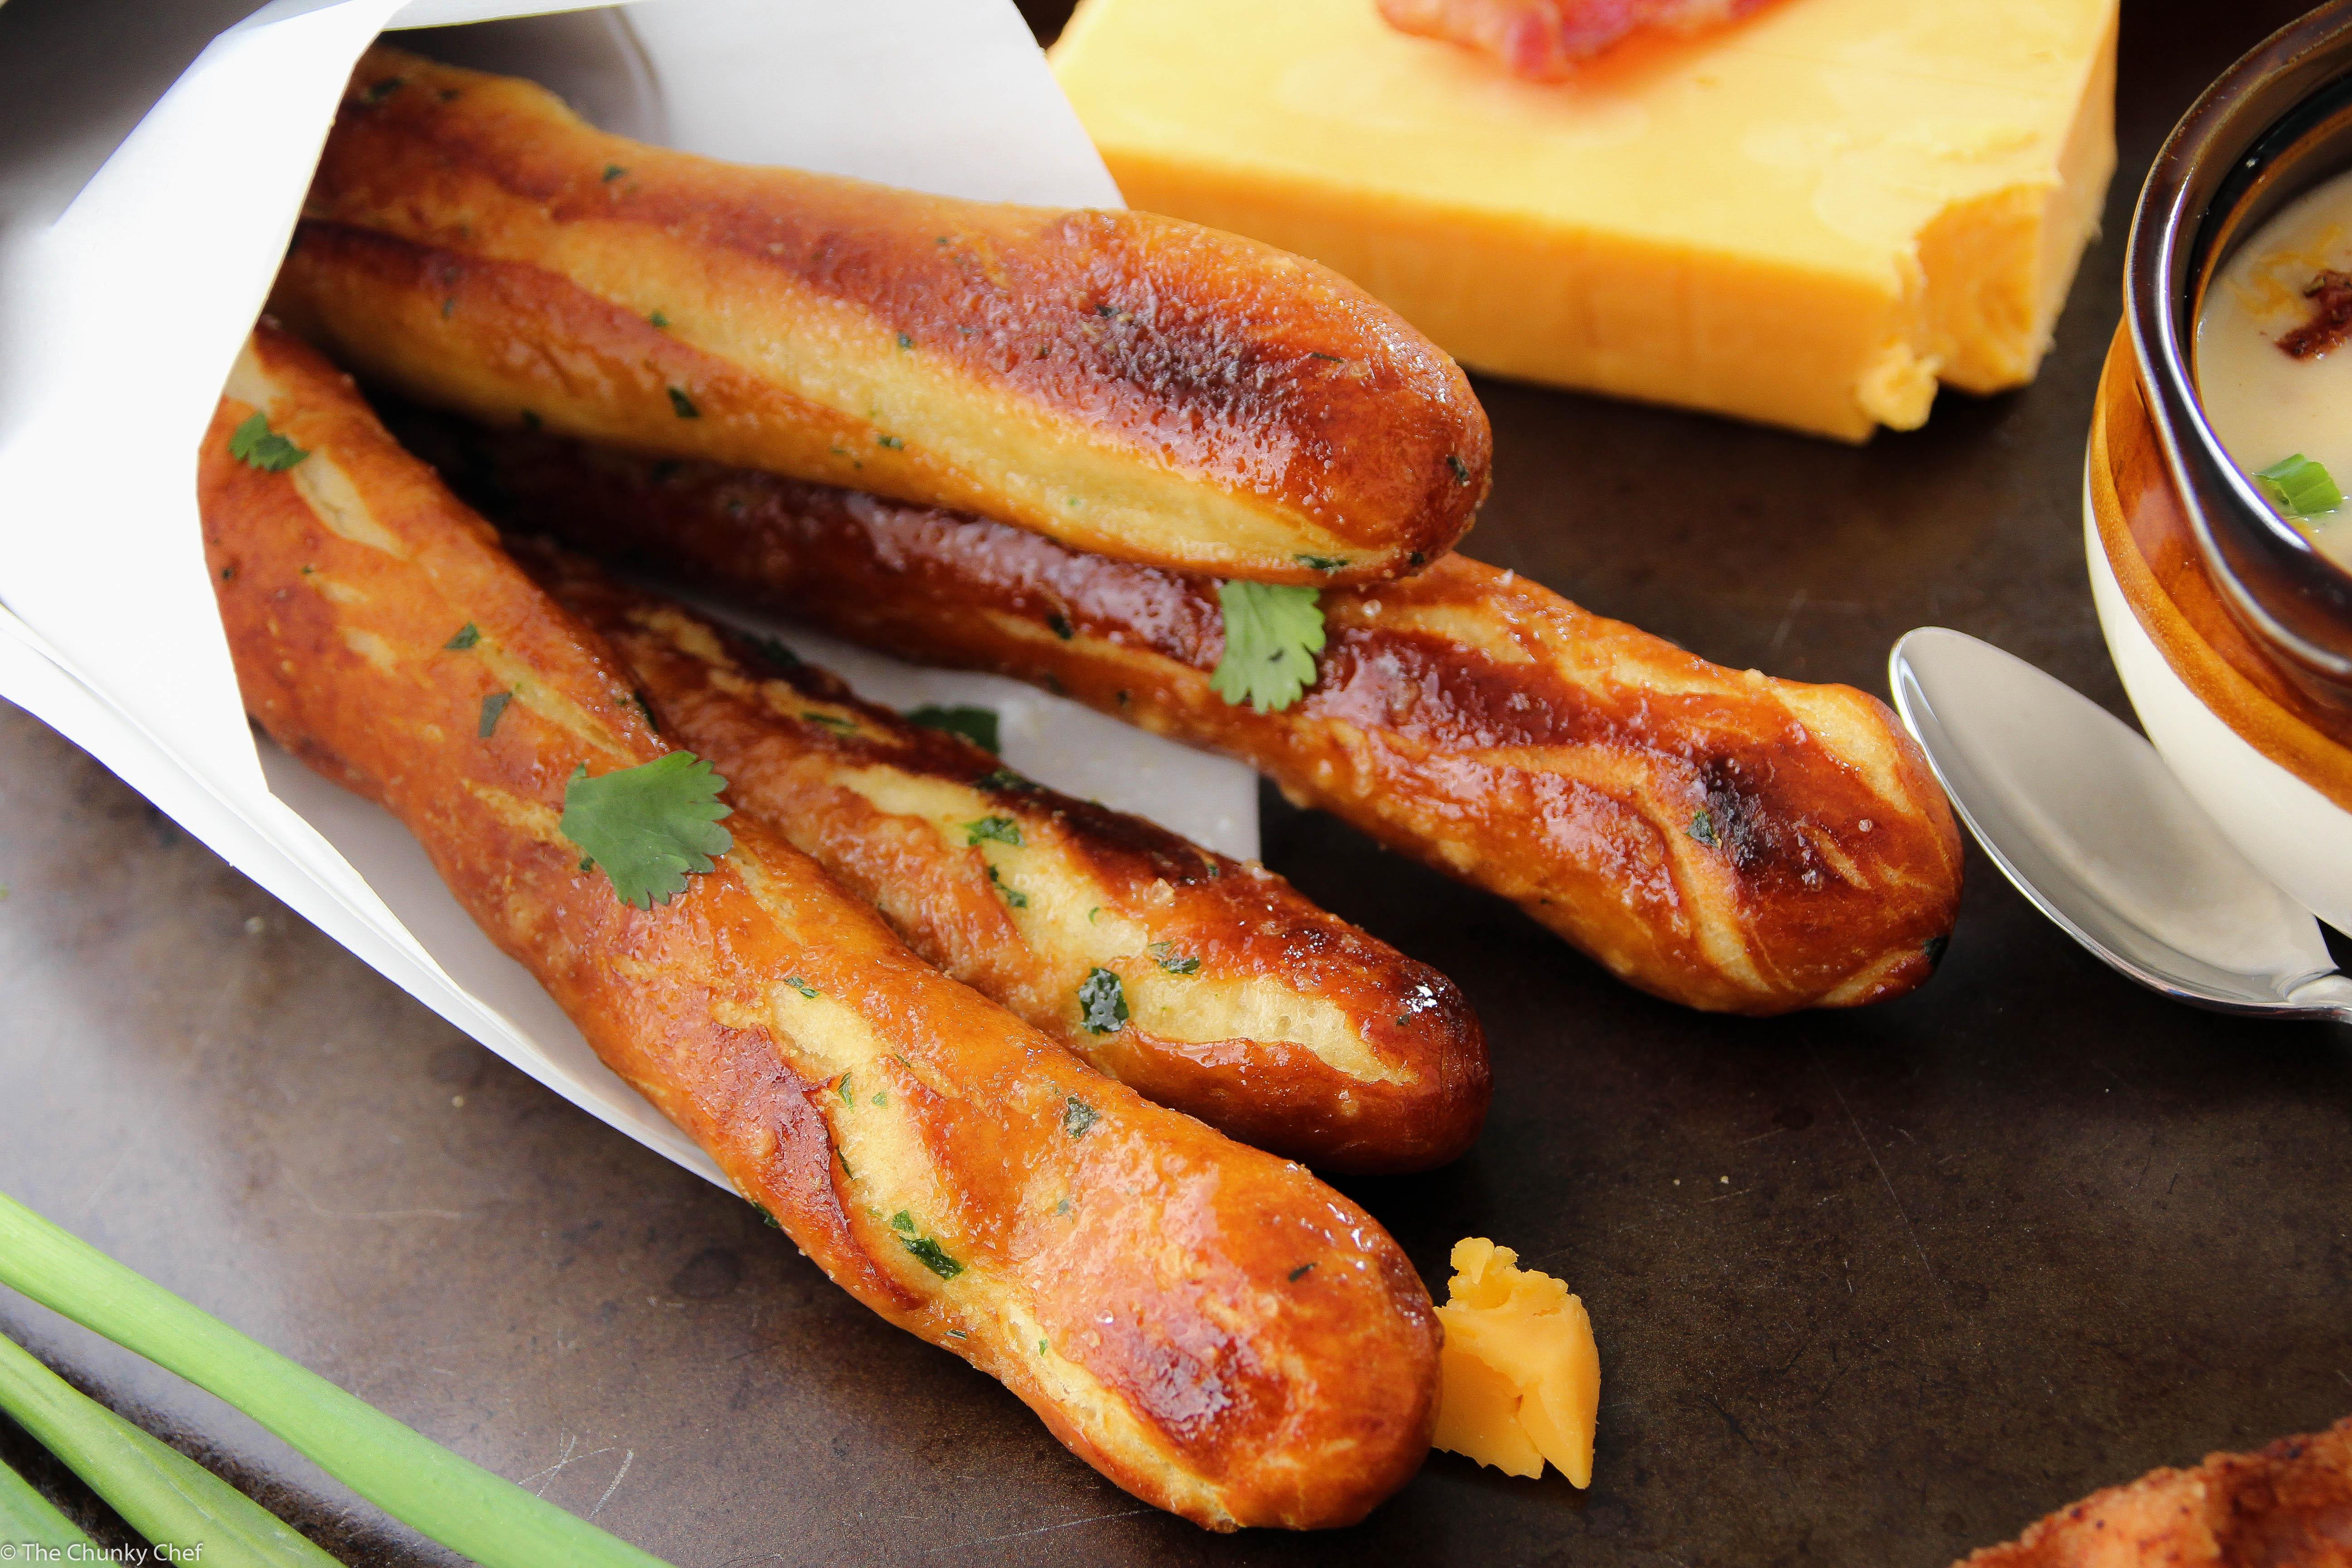 Baked Soft Pretzel Sticks The Chunky Chef